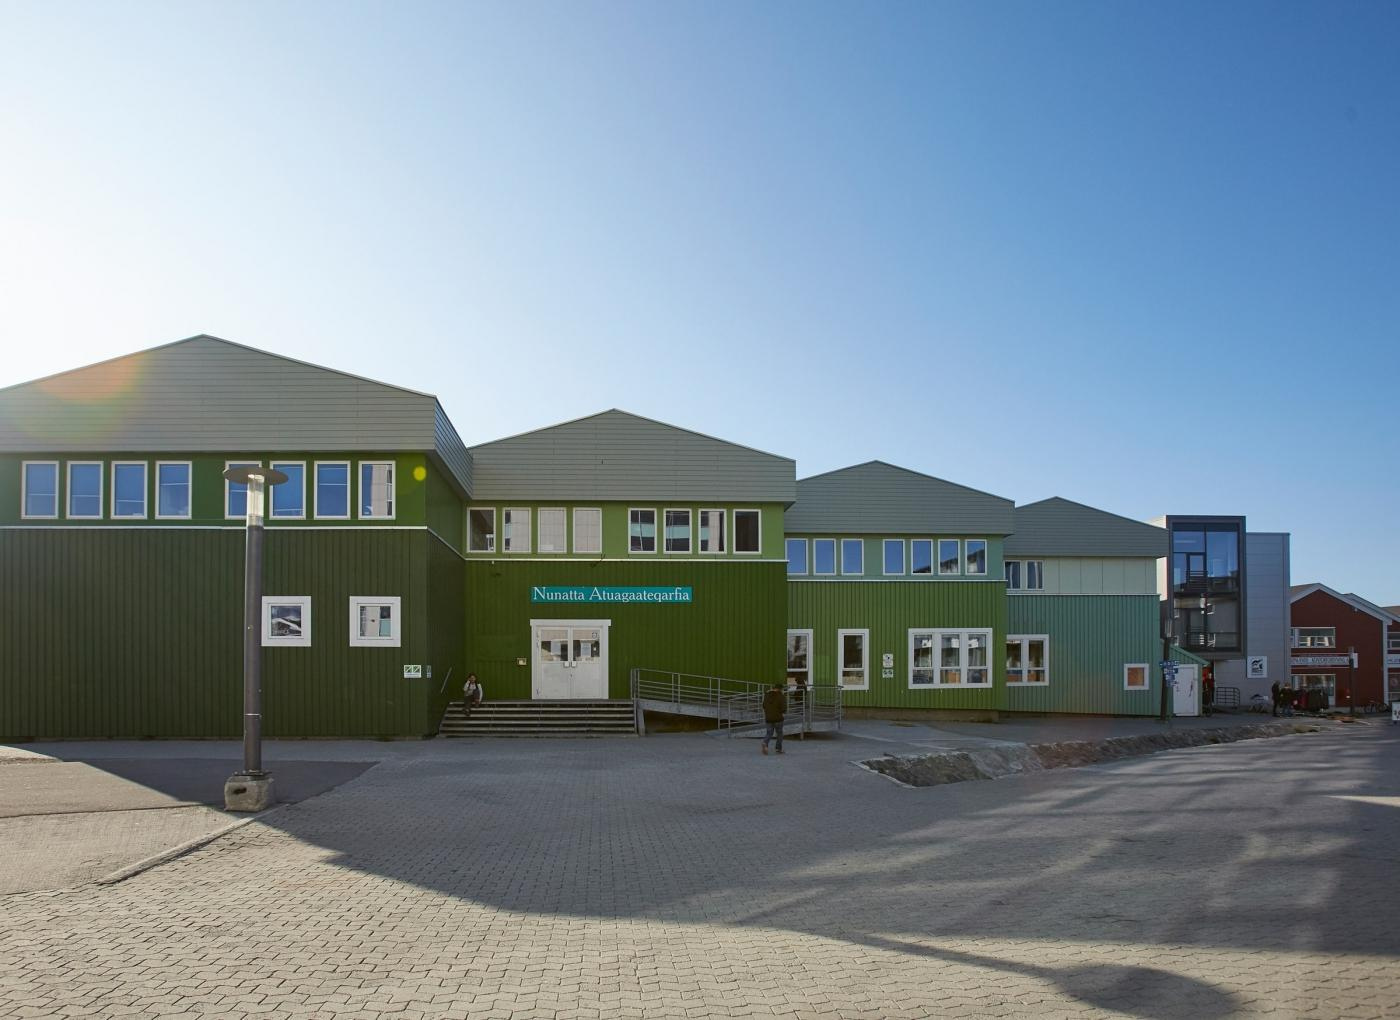 Library Nuuk - Peter Lindstrom - Visit Greenland